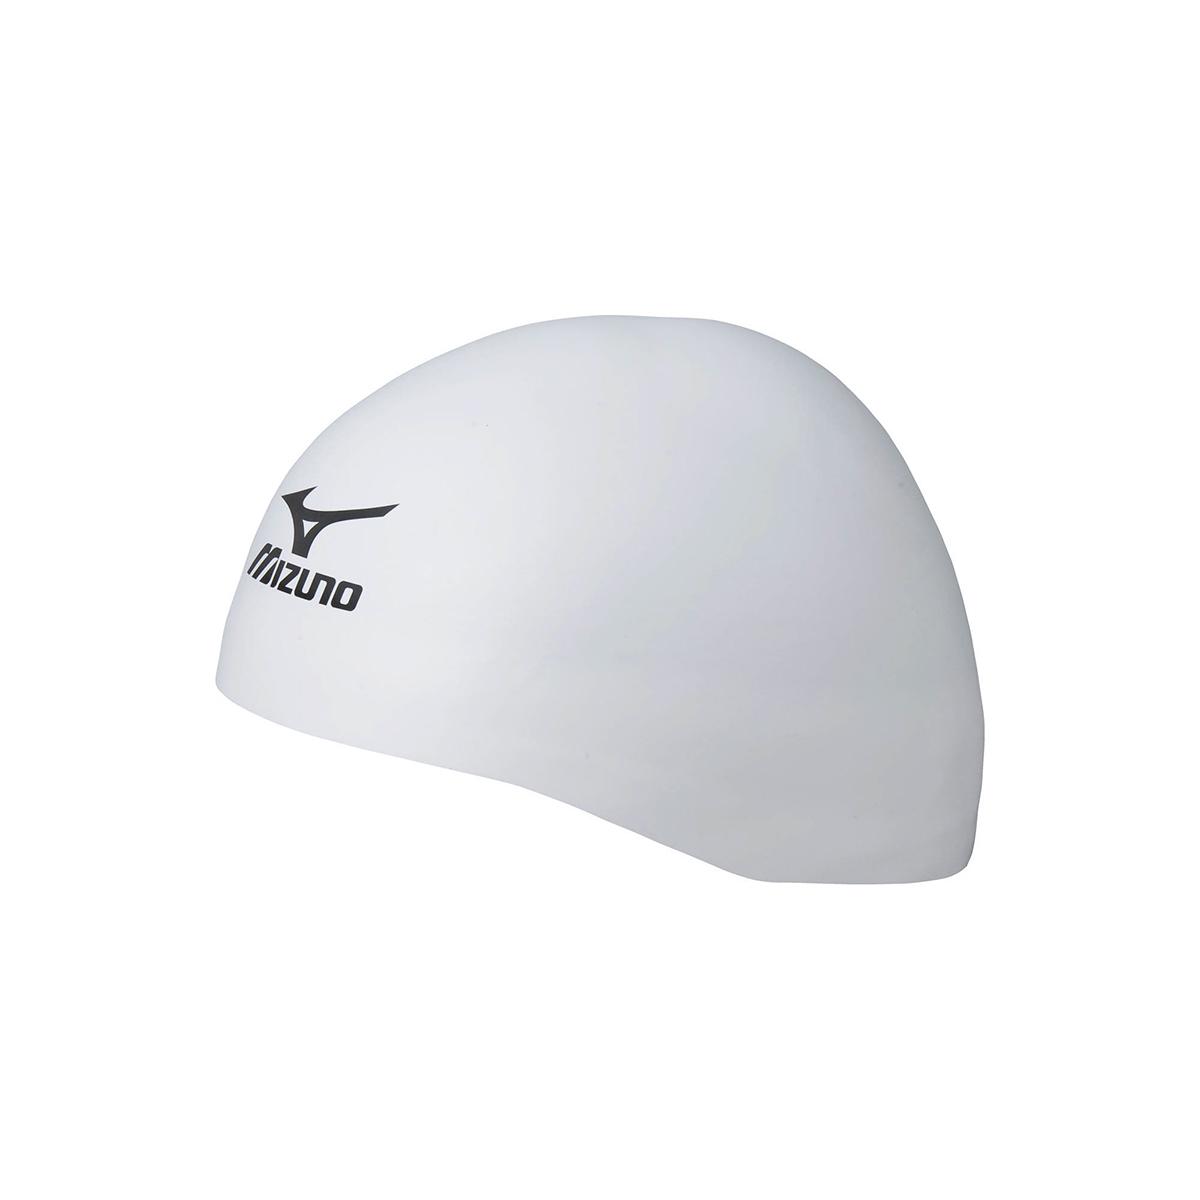 71a912aa6fb3e GX-SONIC HEAD PLUS - SWIM CAP FOR RACE White